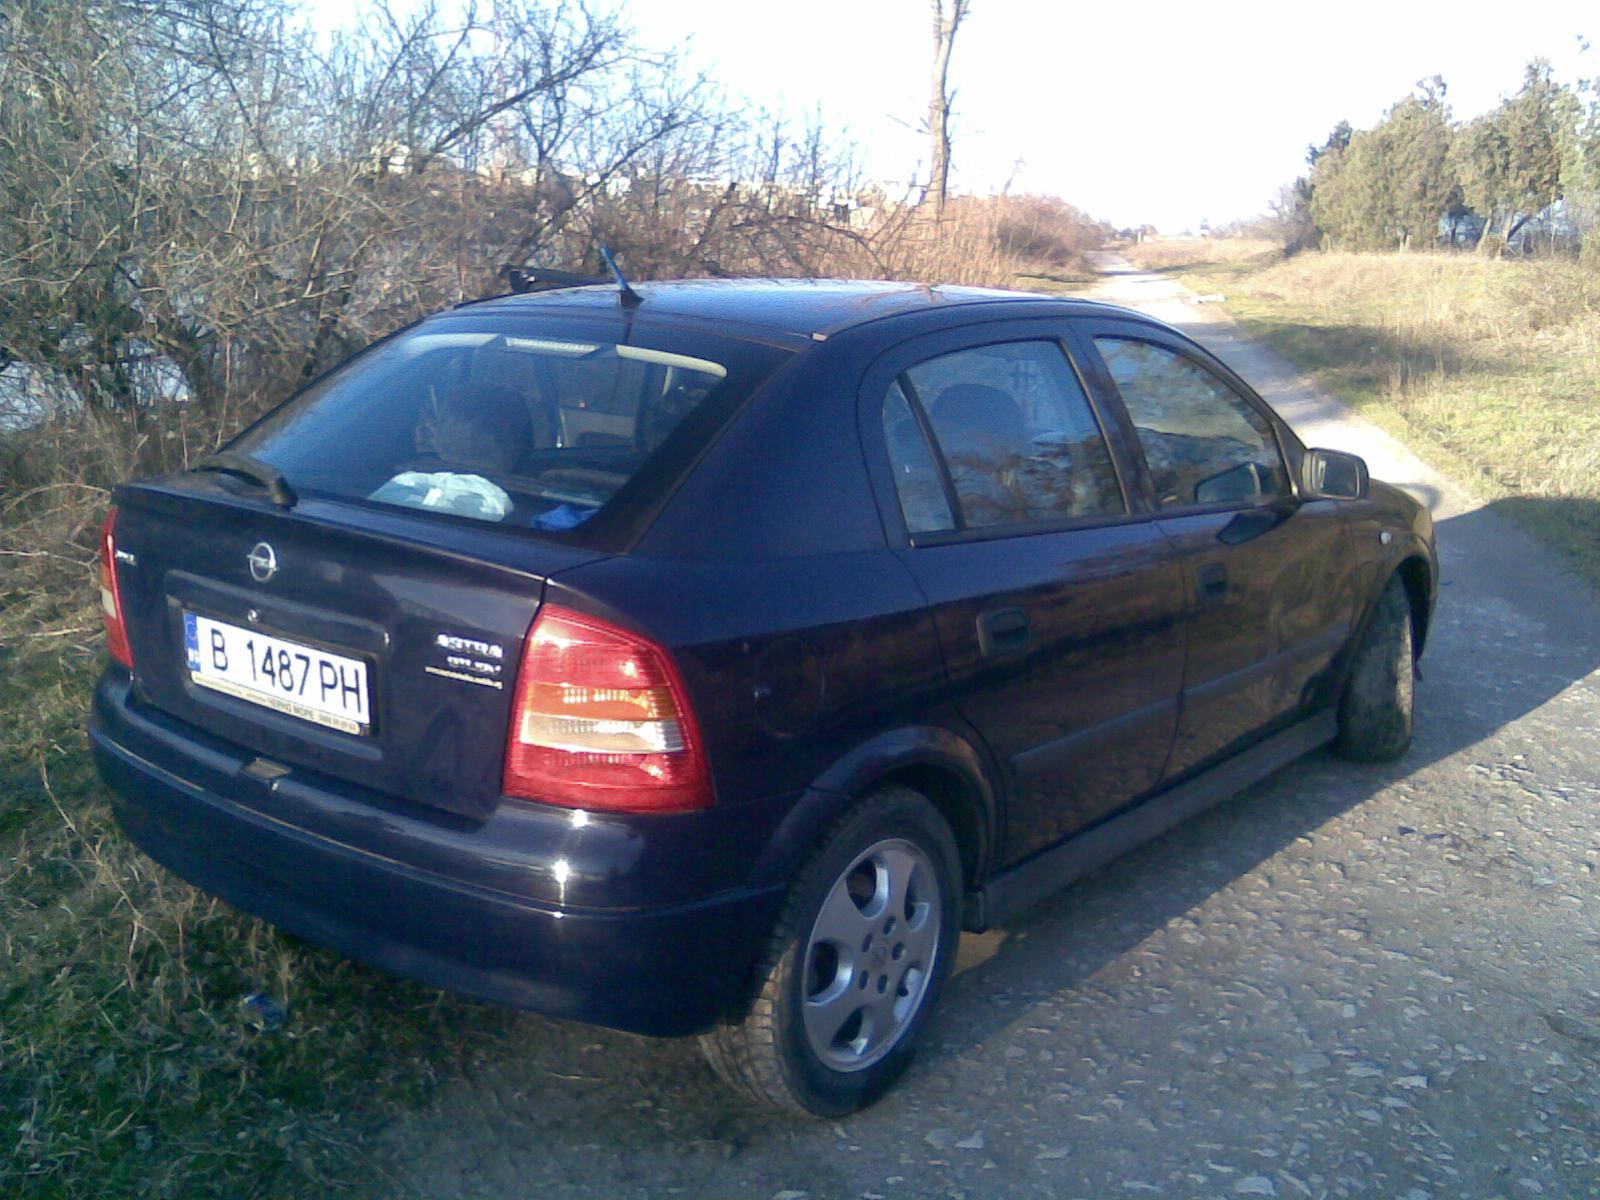 Opel Astra-G avariat 2000 Diesel Hatchback - 18 Februarie 2011 - Poza 2